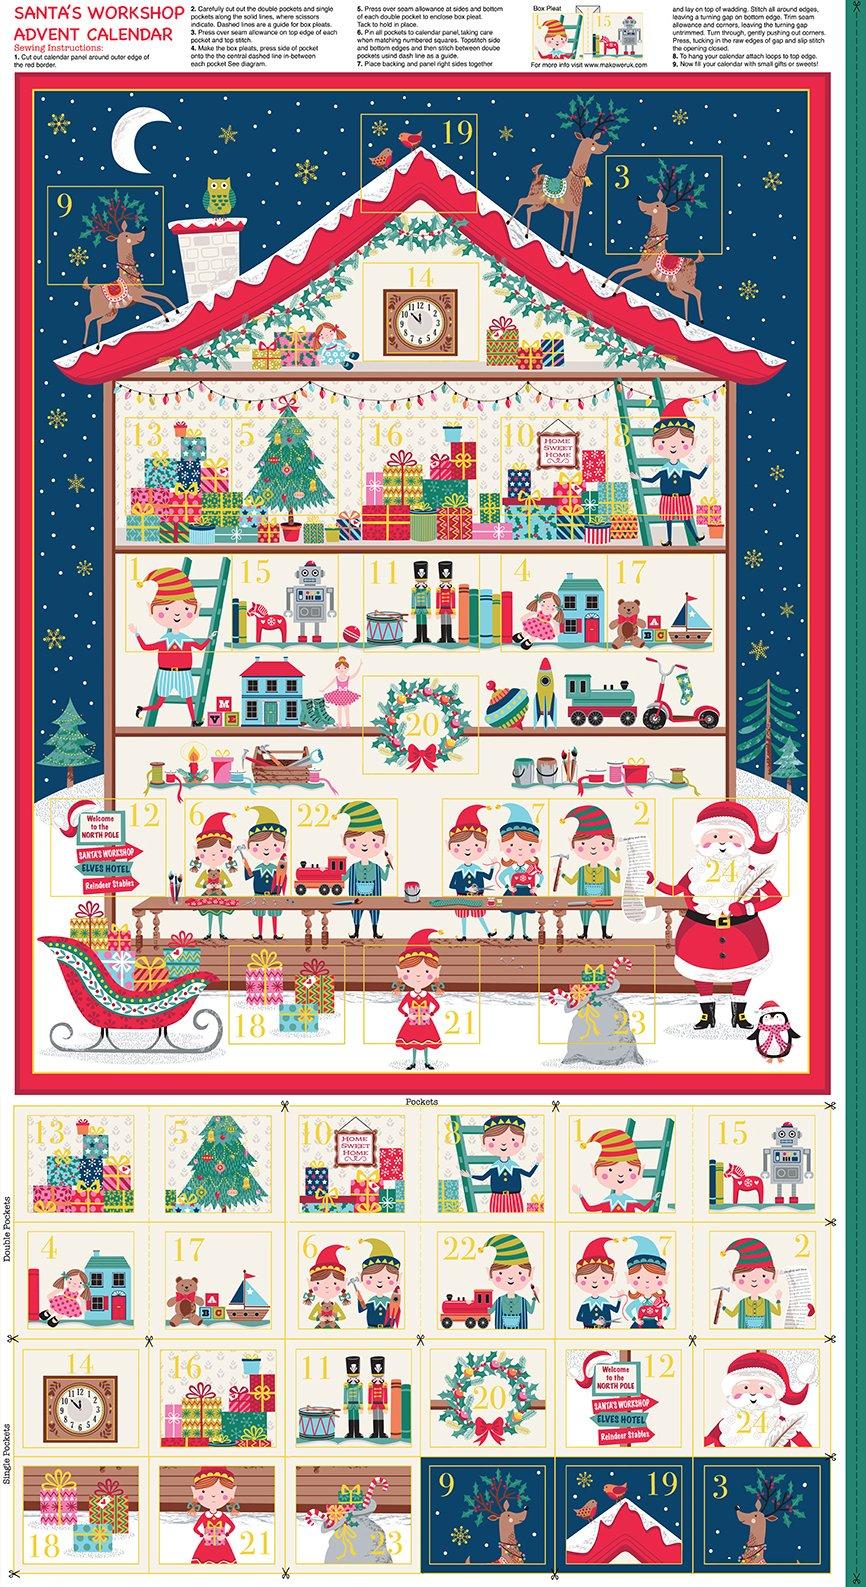 Let It Snow Santa's Workshop Advent 2227/1 by Makower UK